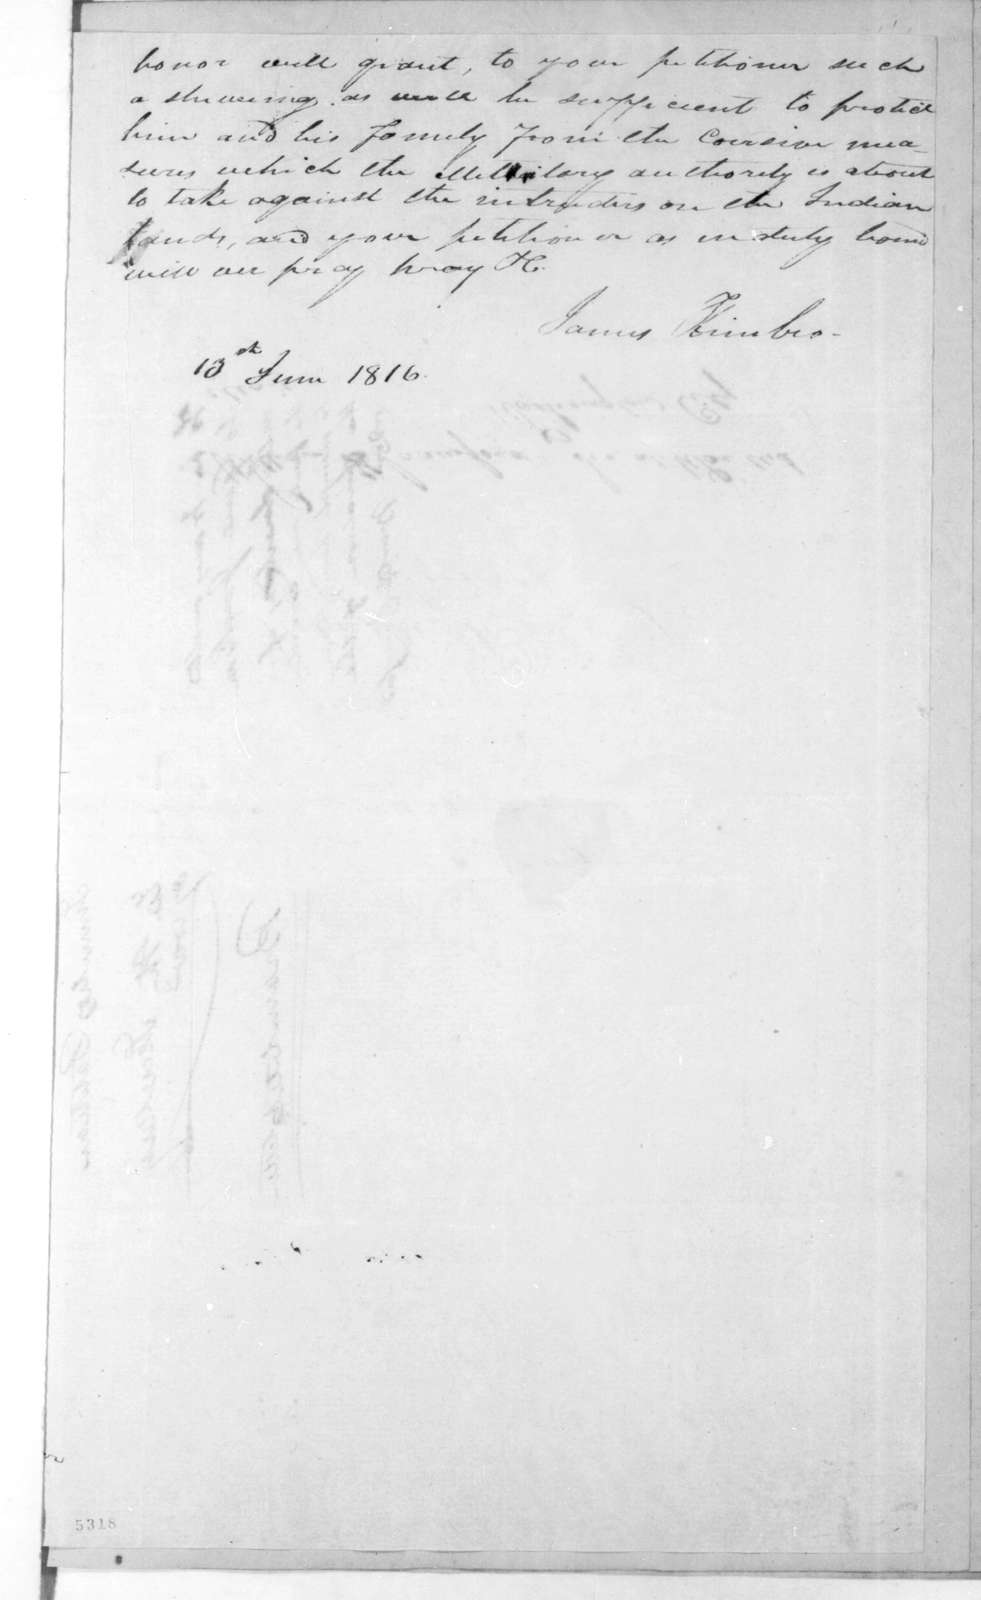 Lonsford M. Bramlitt to William Harris Crawford, June 13, 1816